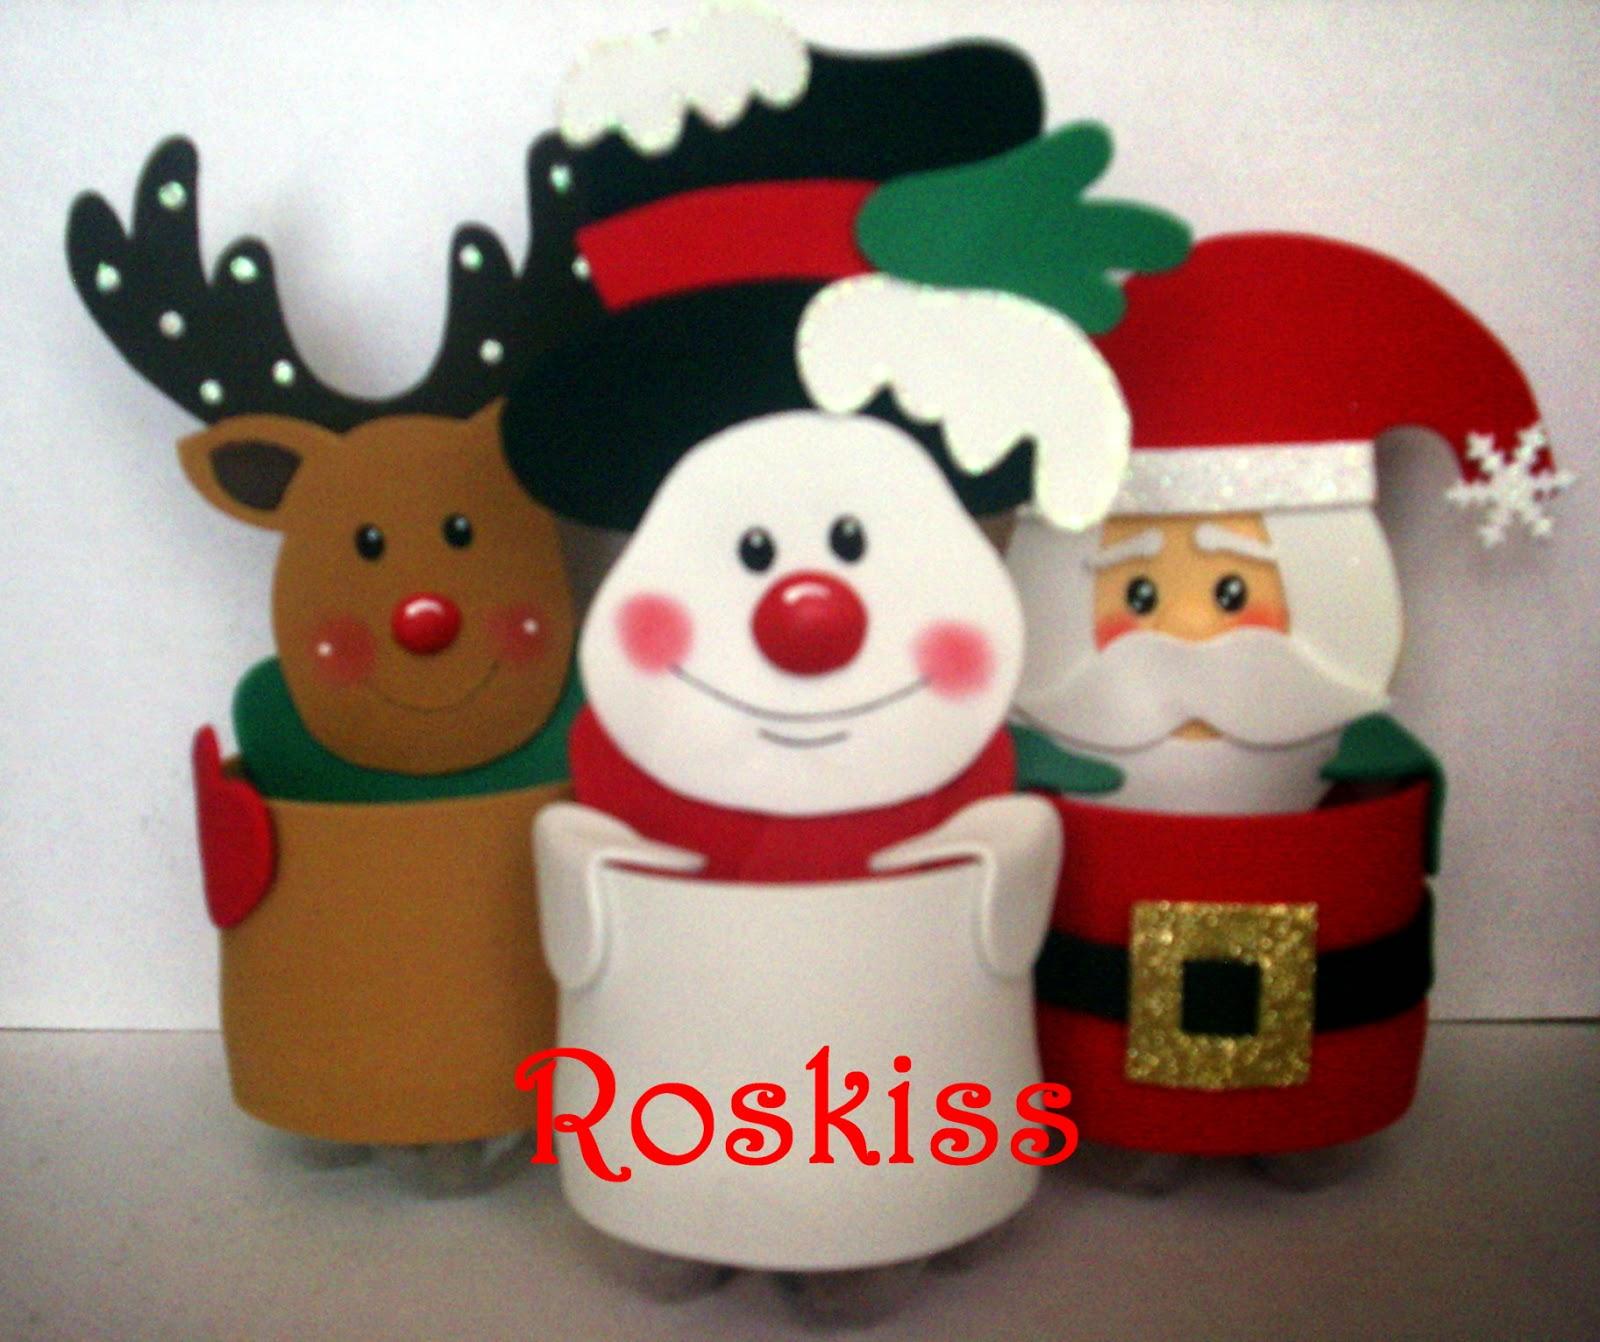 El atelier de roskiss dulceros navide os for Figuras de nieve navidenas